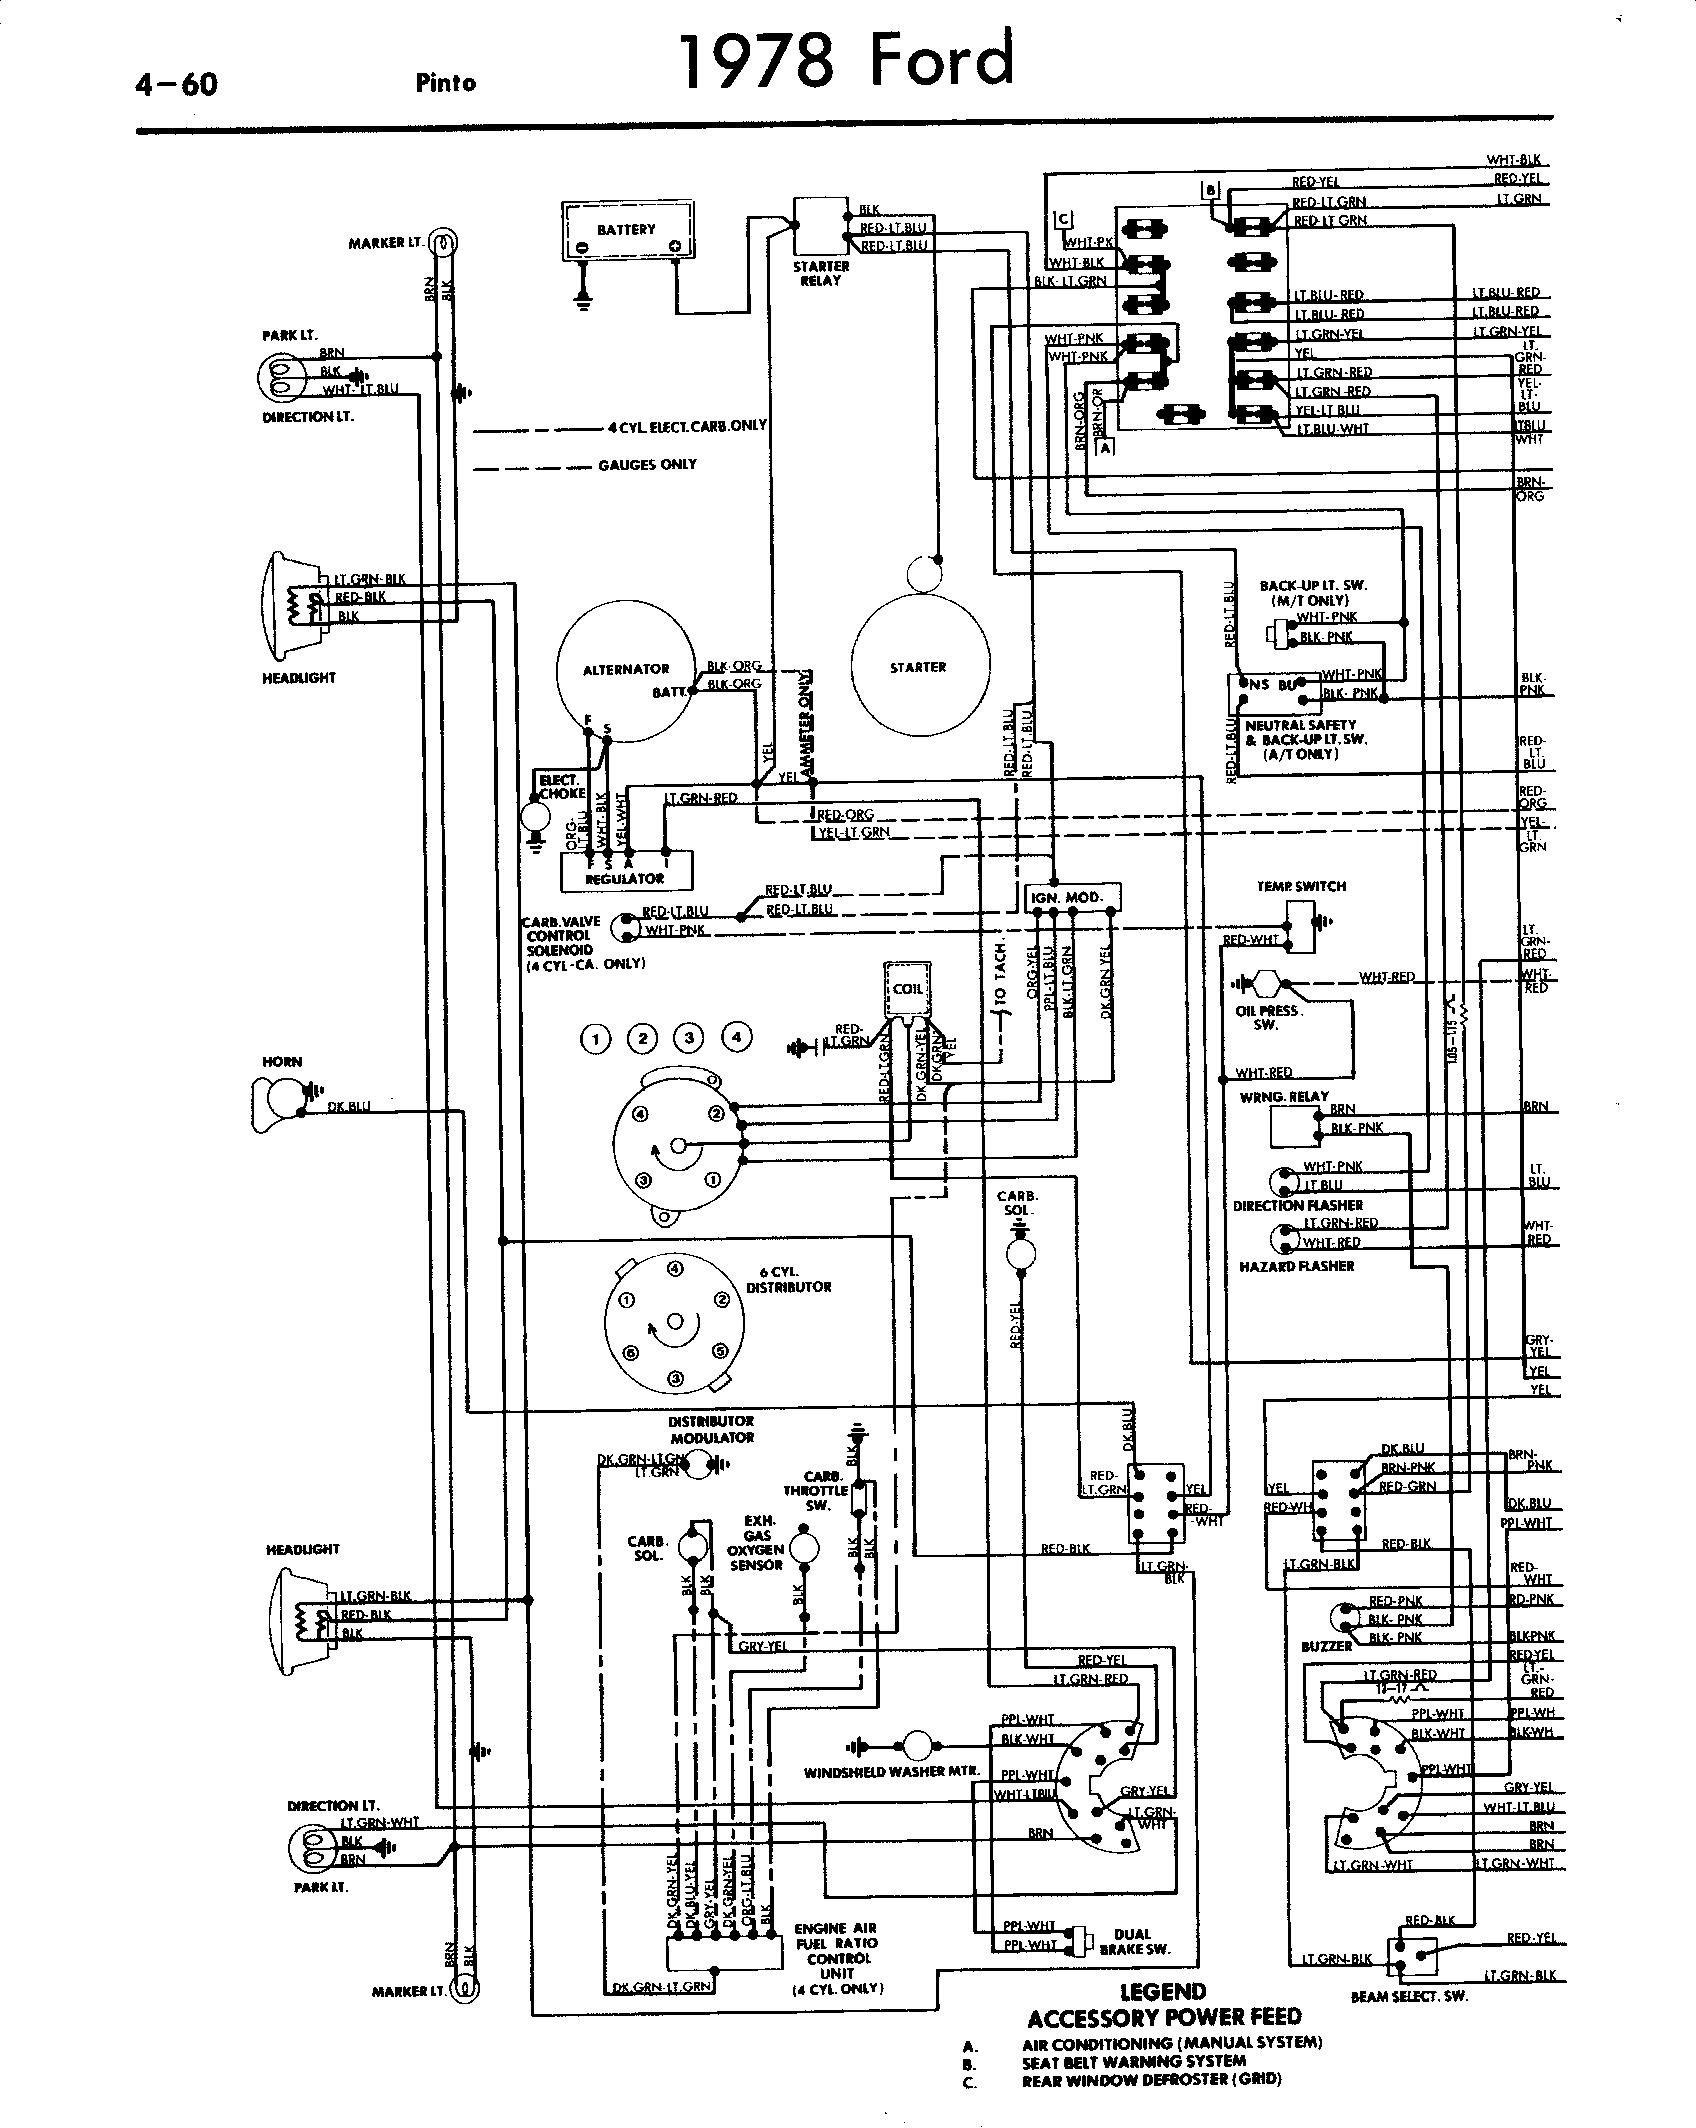 ford pinto distributor diagram - wiring diagram hen-setup-b -  hen-setup-b.cinemamanzonicasarano.it  cinemamanzonicasarano.it